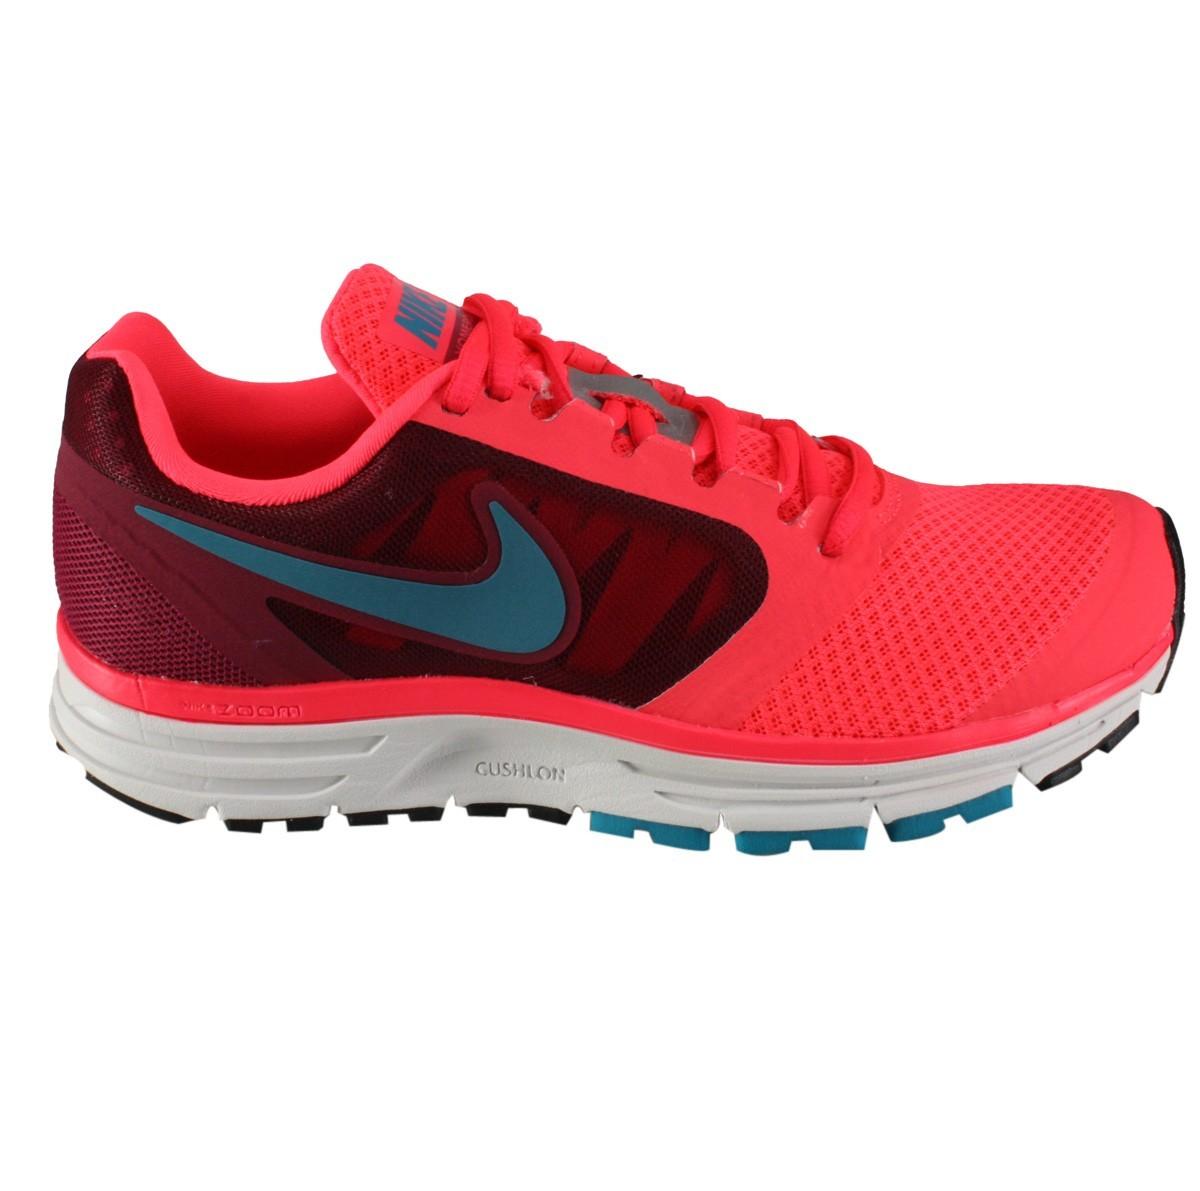 caca2573e16 Bizz Store - Tênis Feminino Nike Zoom Vomero + 8 Laranja Verde